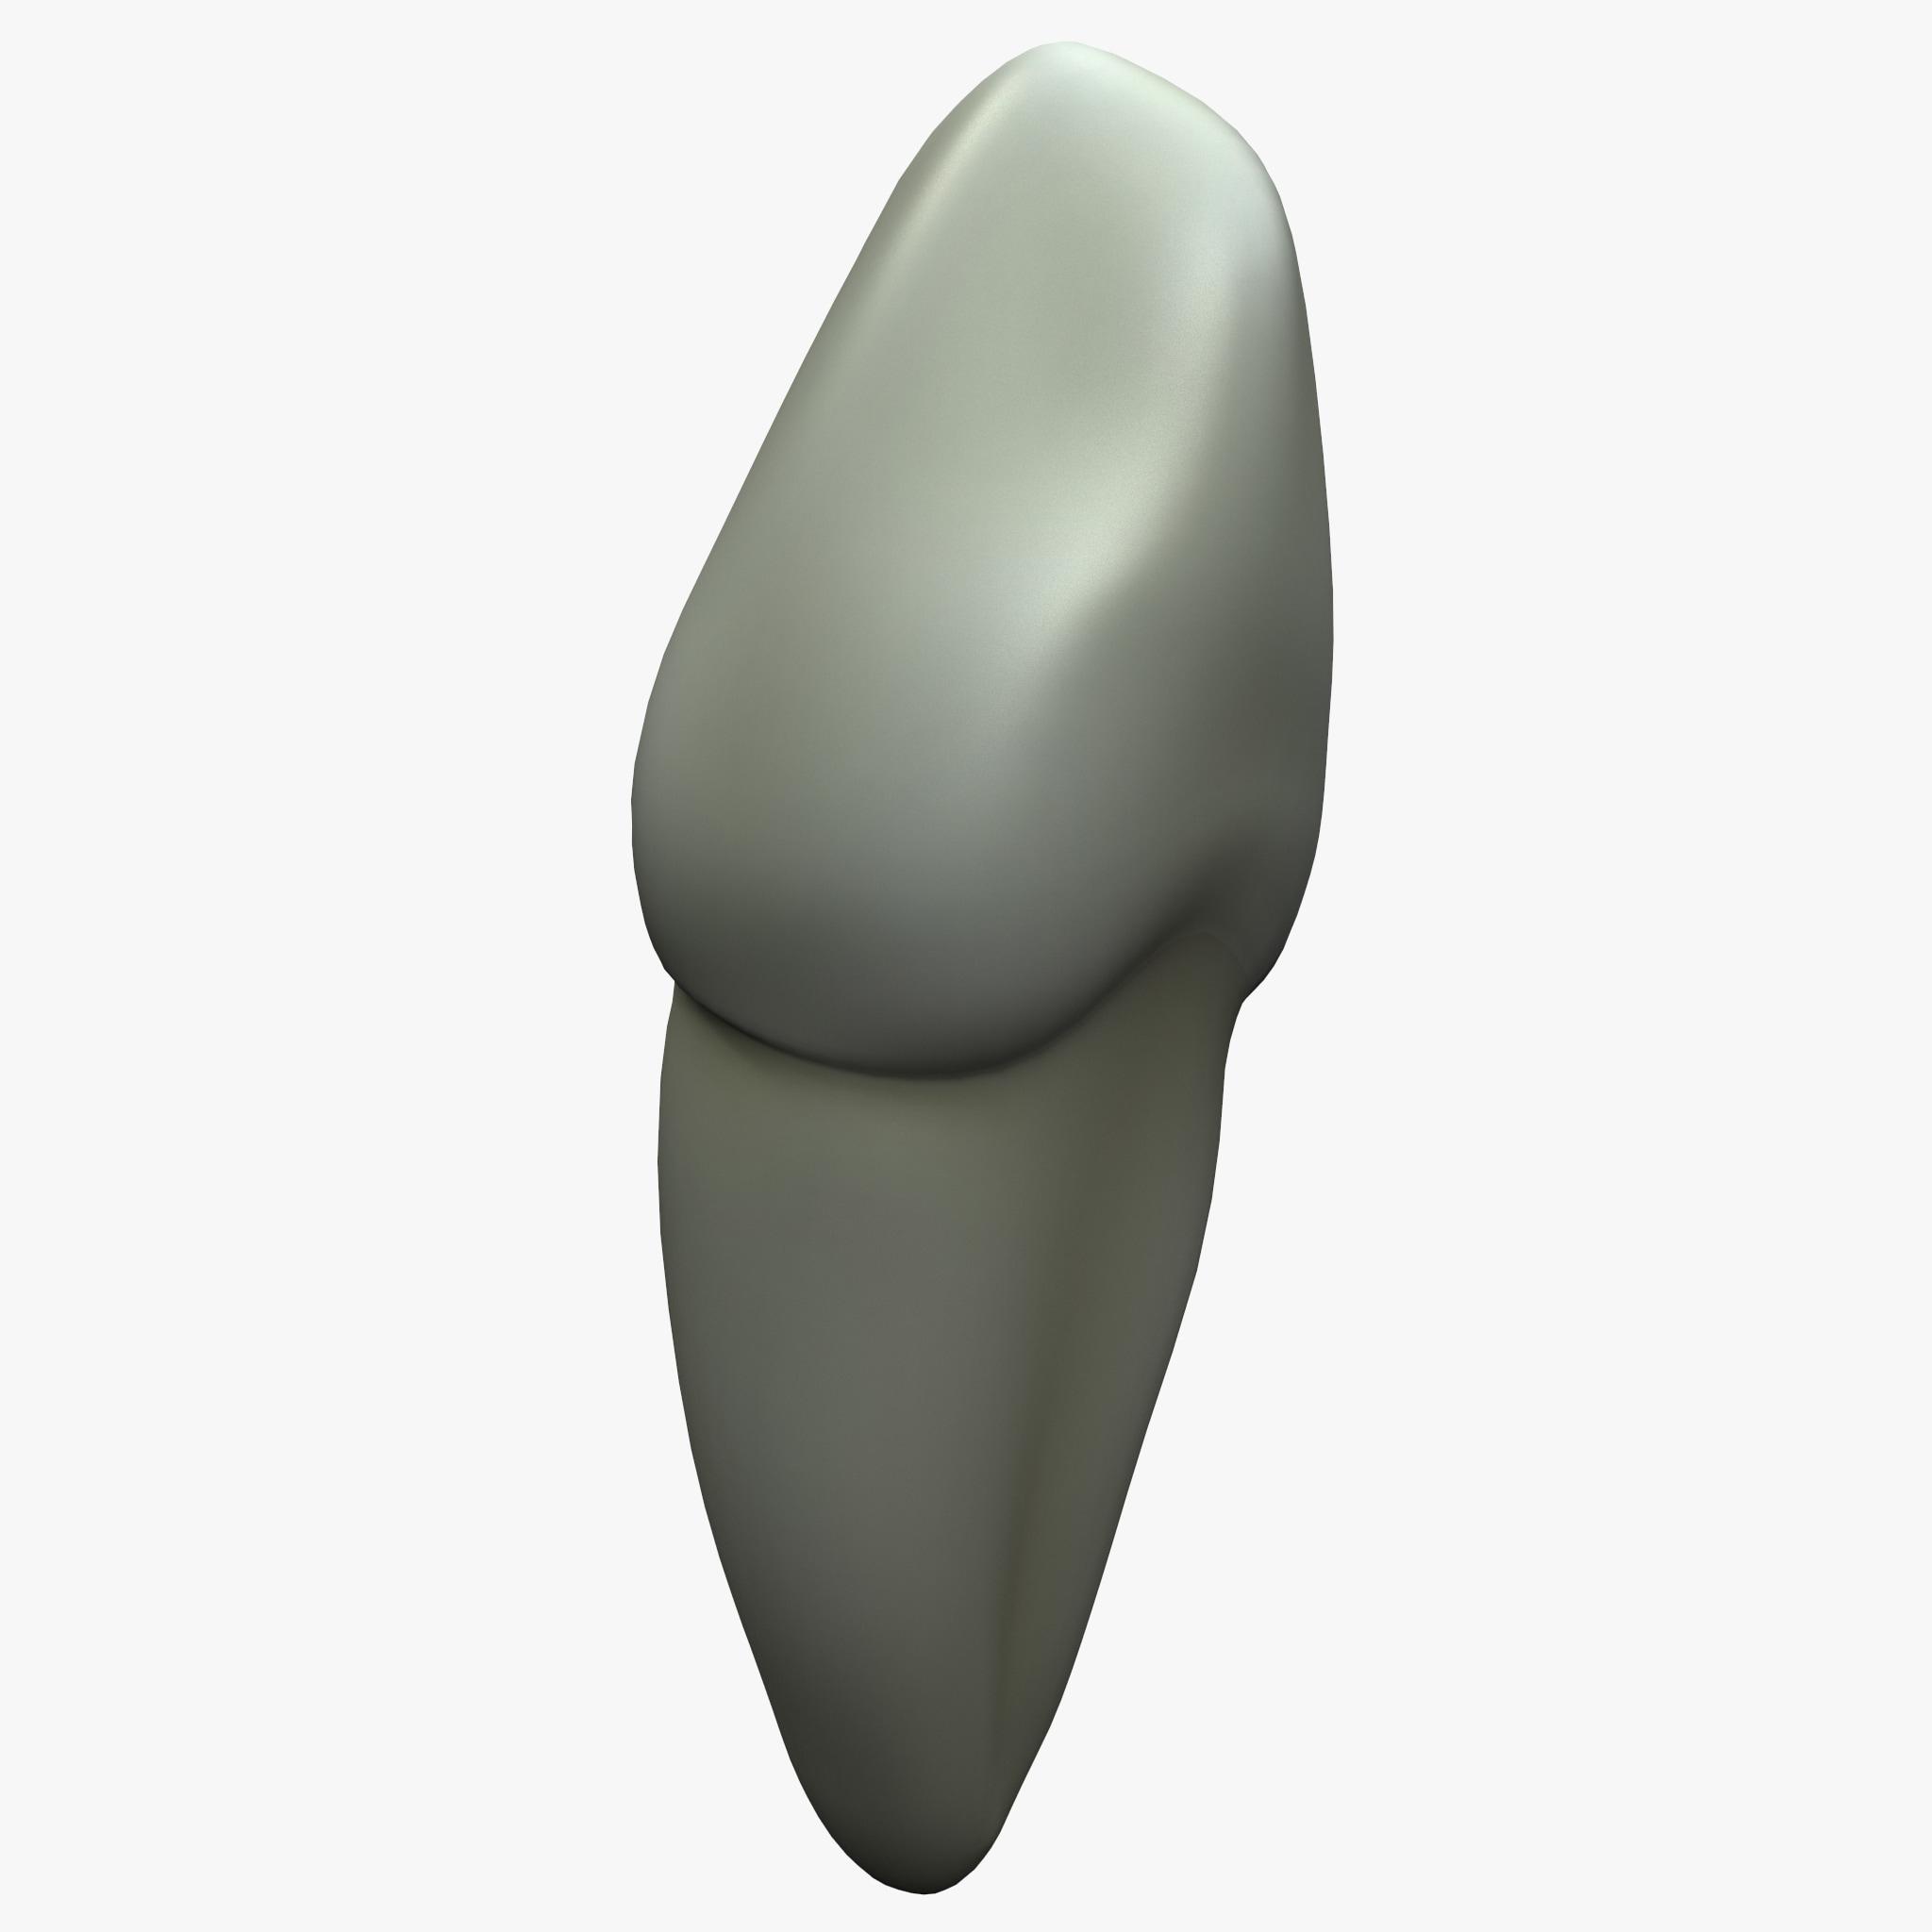 3d cuspid tooth model